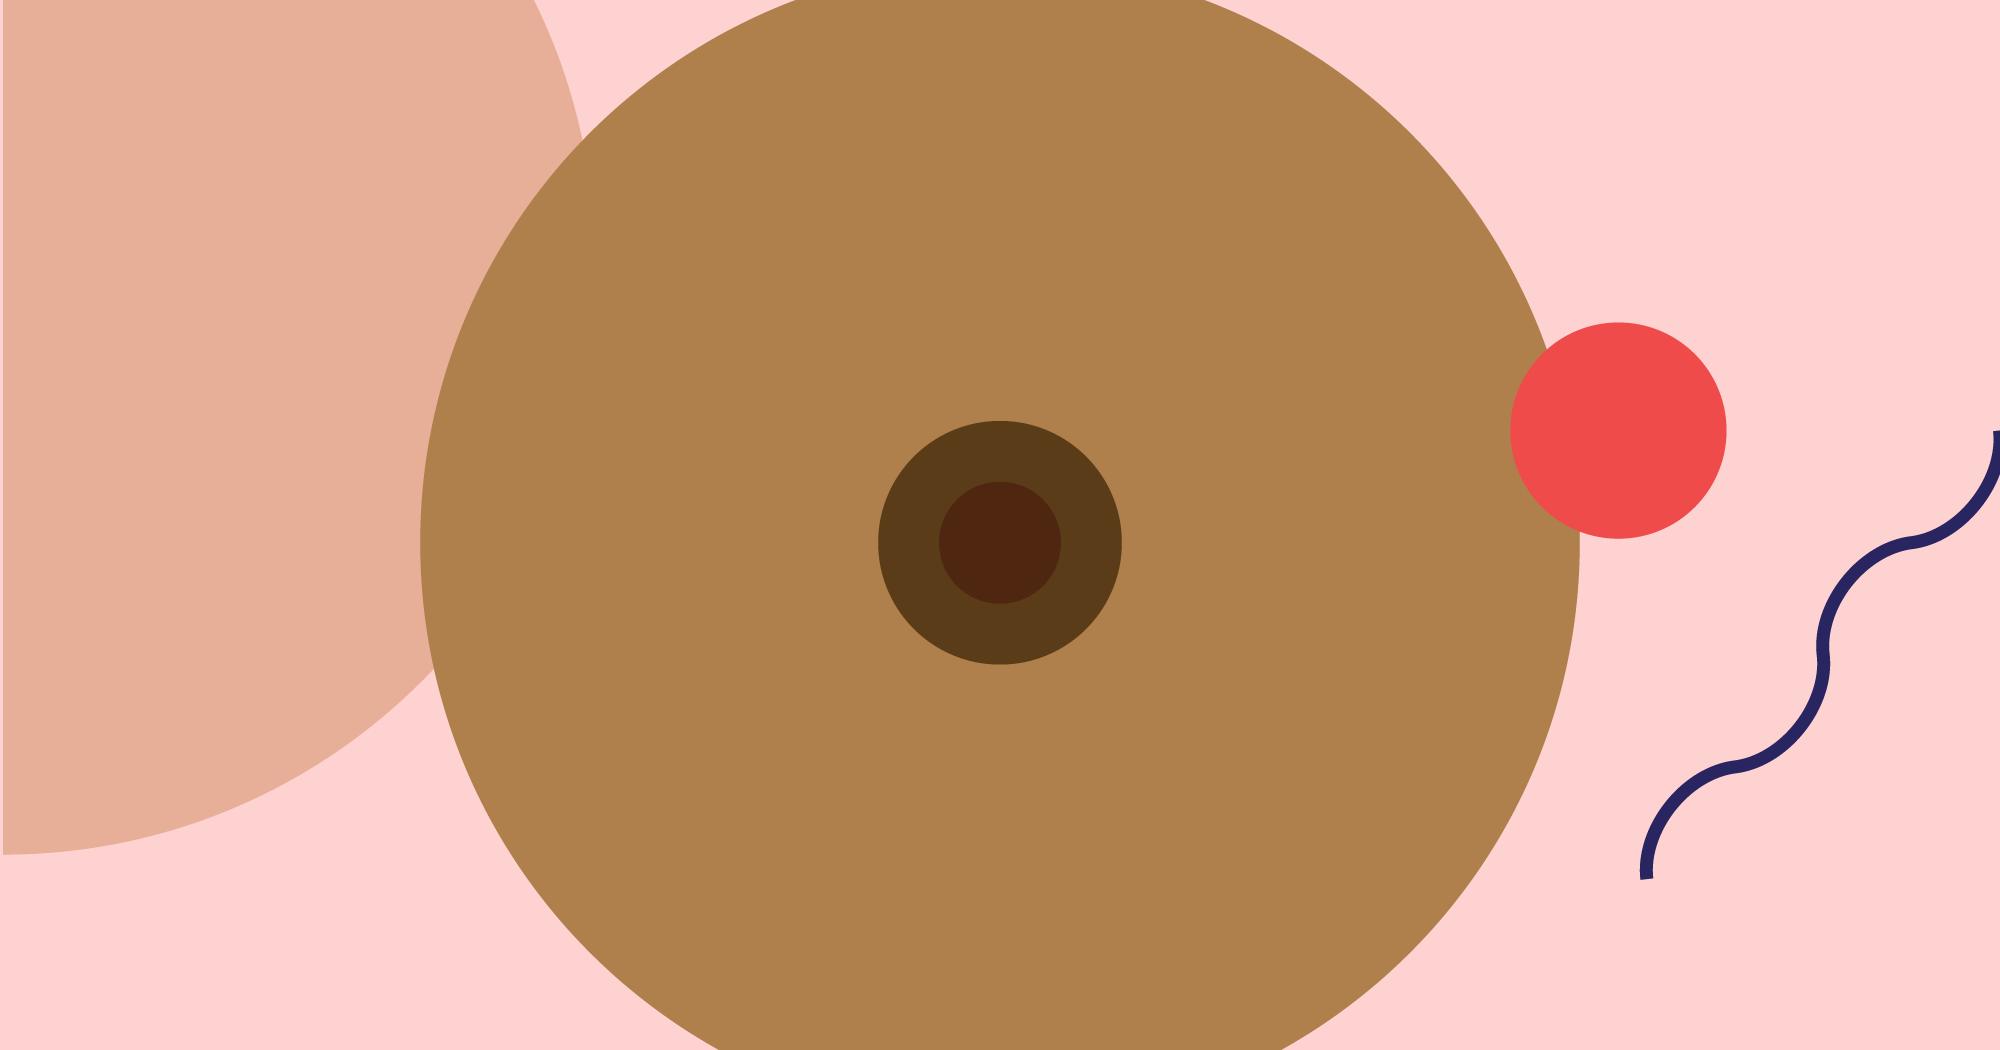 Tiny toy porn